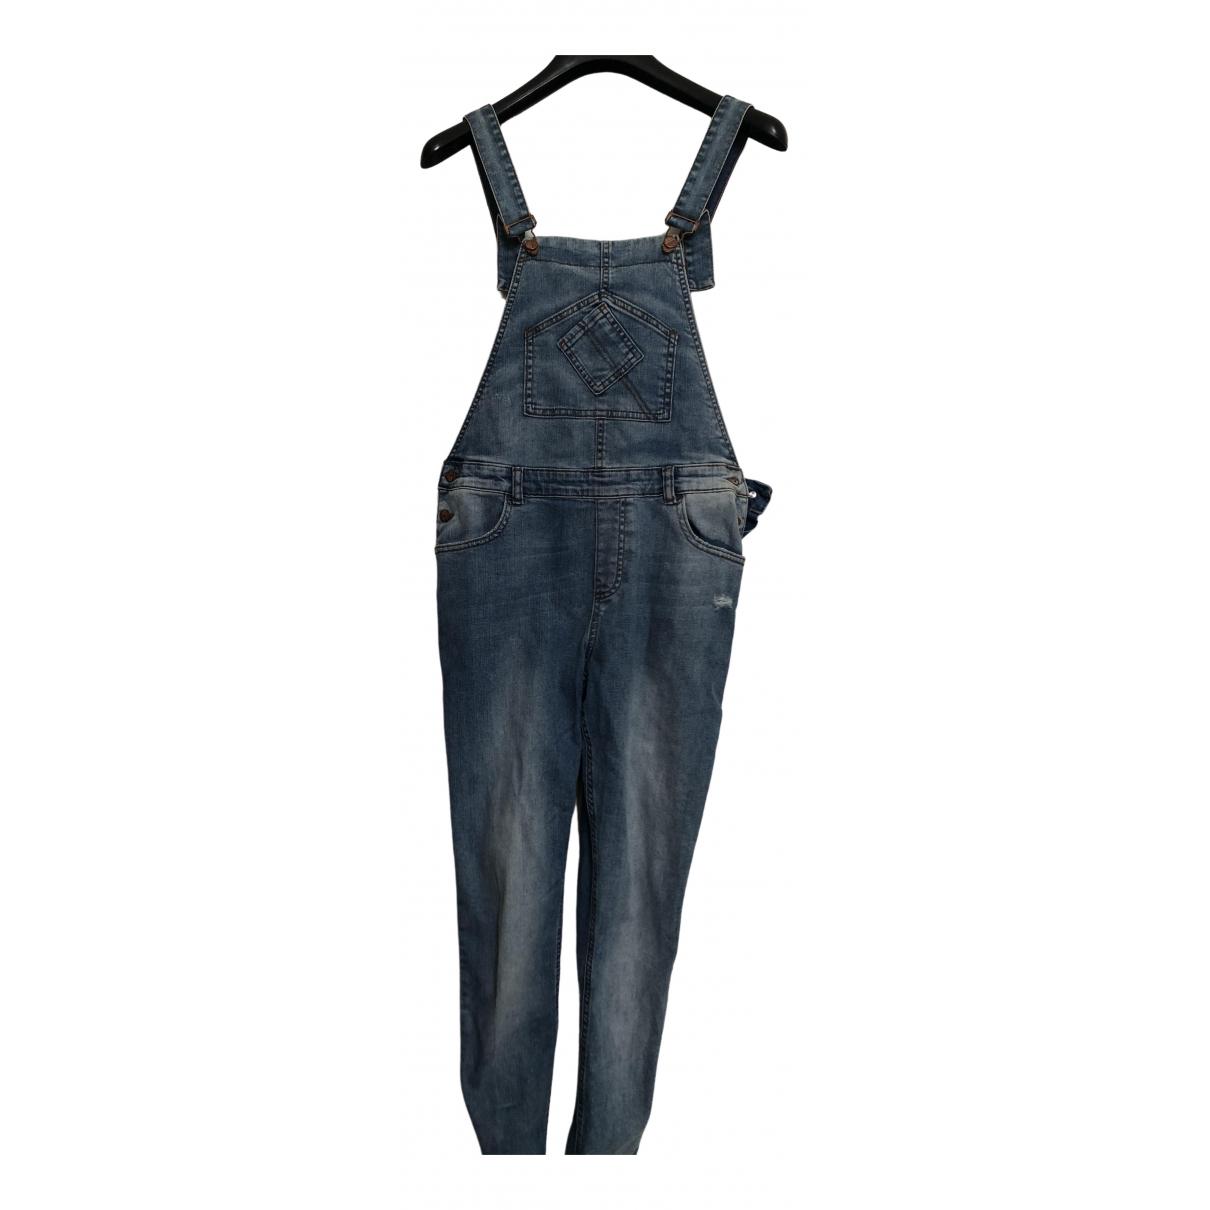 Zara \N Cotton jumpsuit for Women XS International